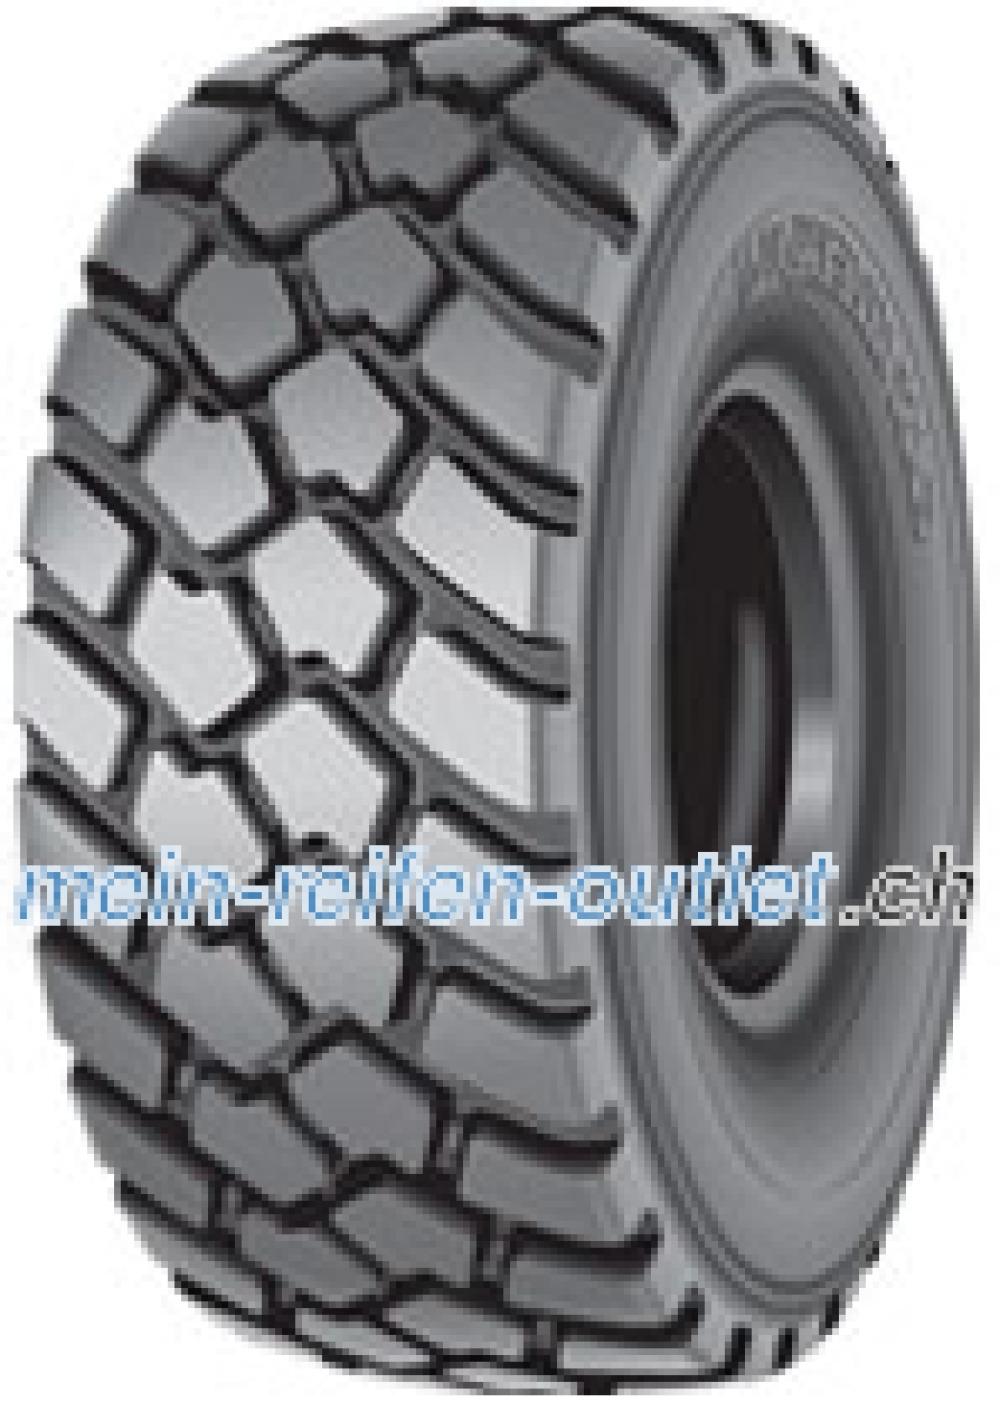 Michelin XLD L3 ( 650/65 R25 TL Doppelkennung 23.5R25 , Tragfähigkeit * )